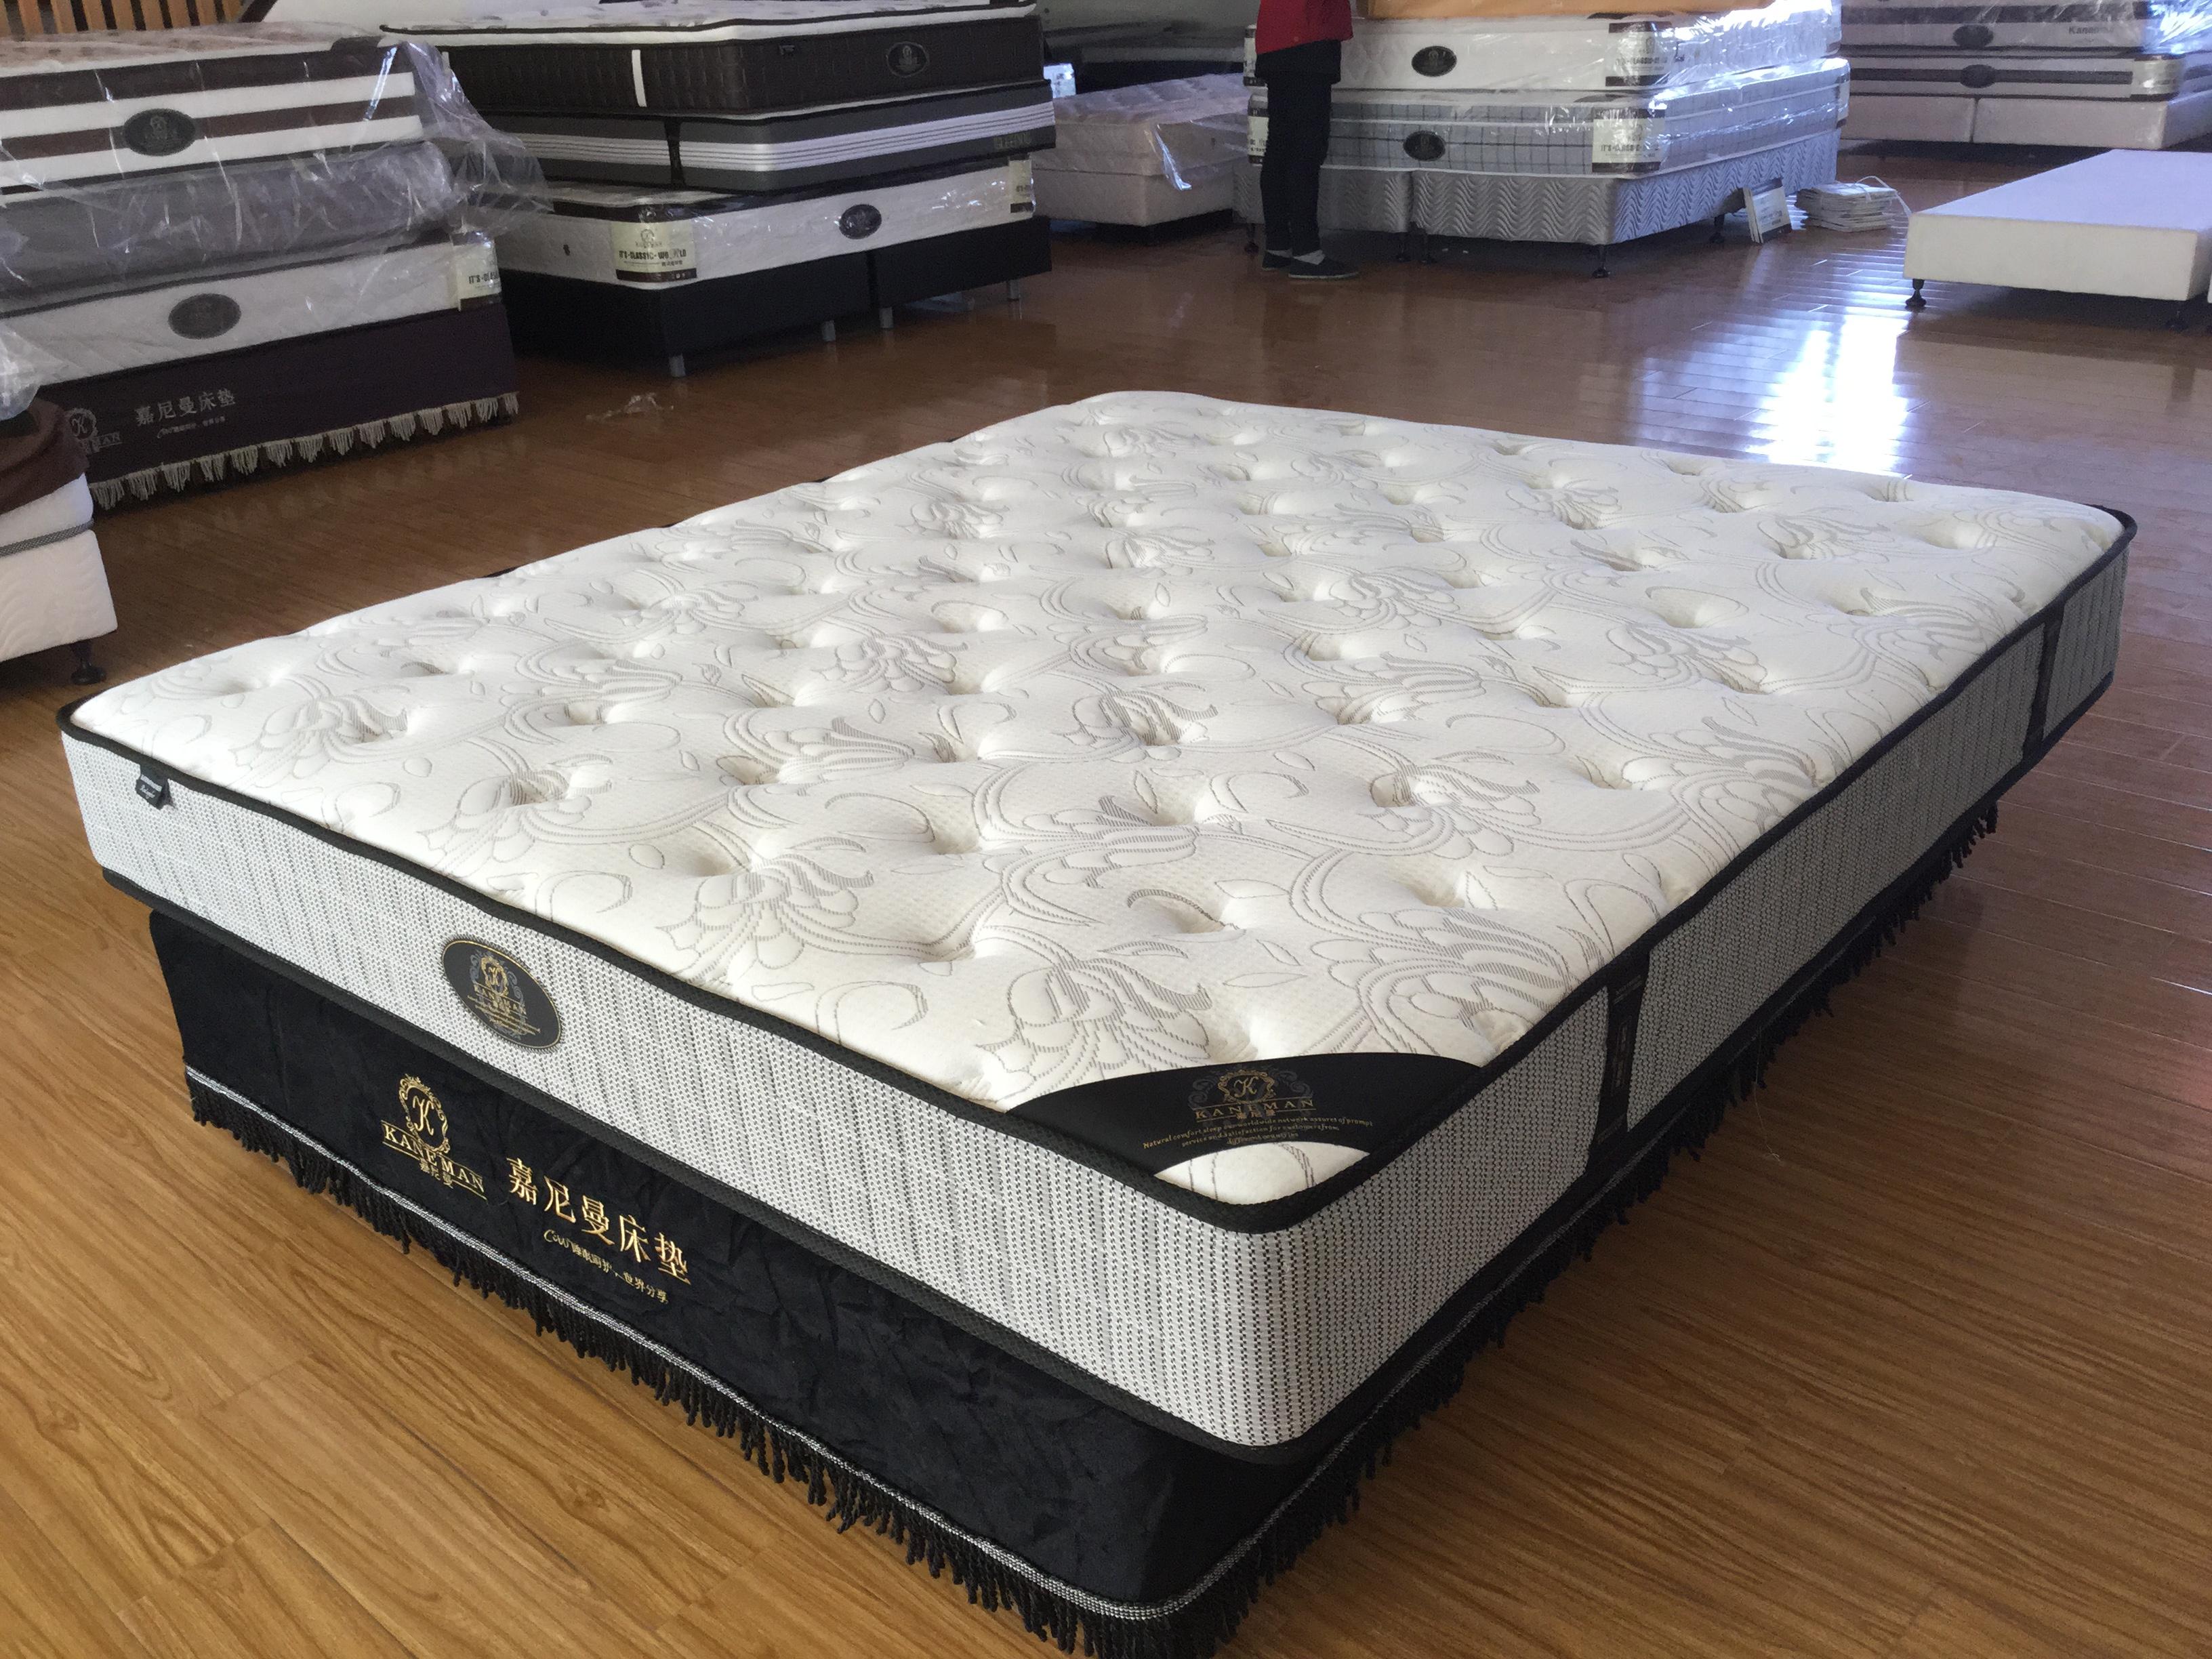 hot sale cheap spring mattress compress package wholesale - Jozy Mattress | Jozy.net